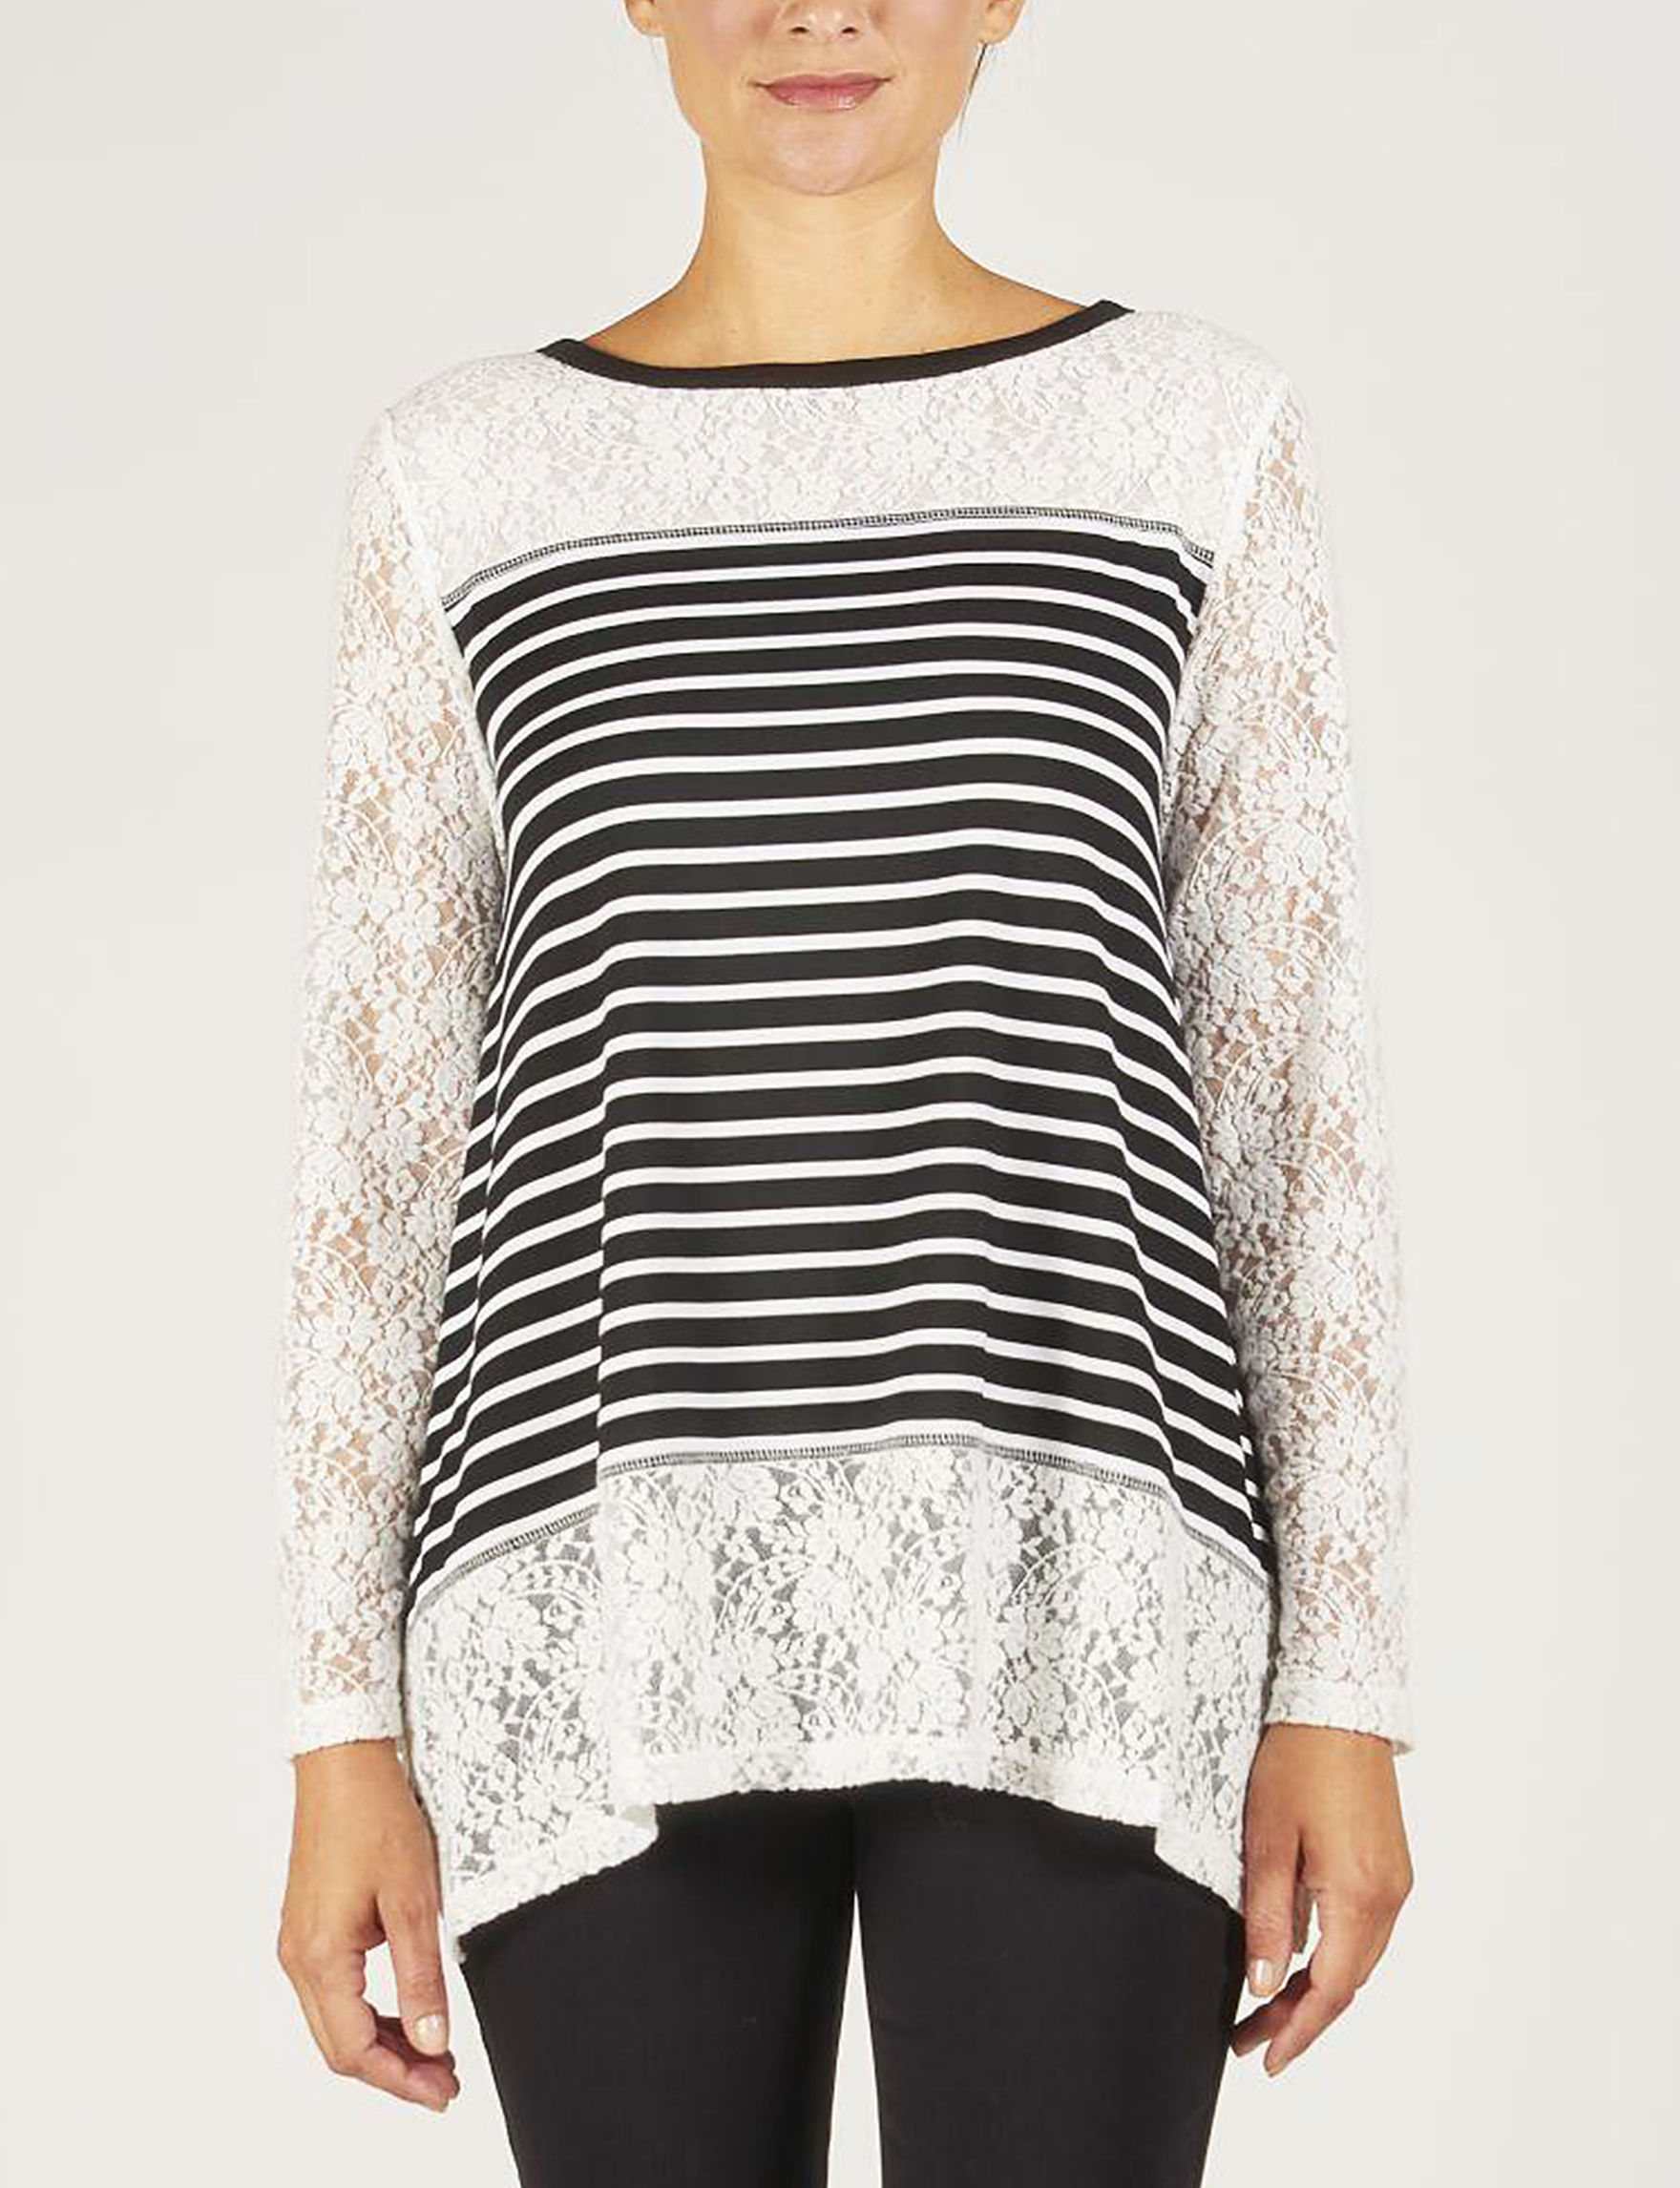 Skyes The Limit Black / White Stripe Shirts & Blouses